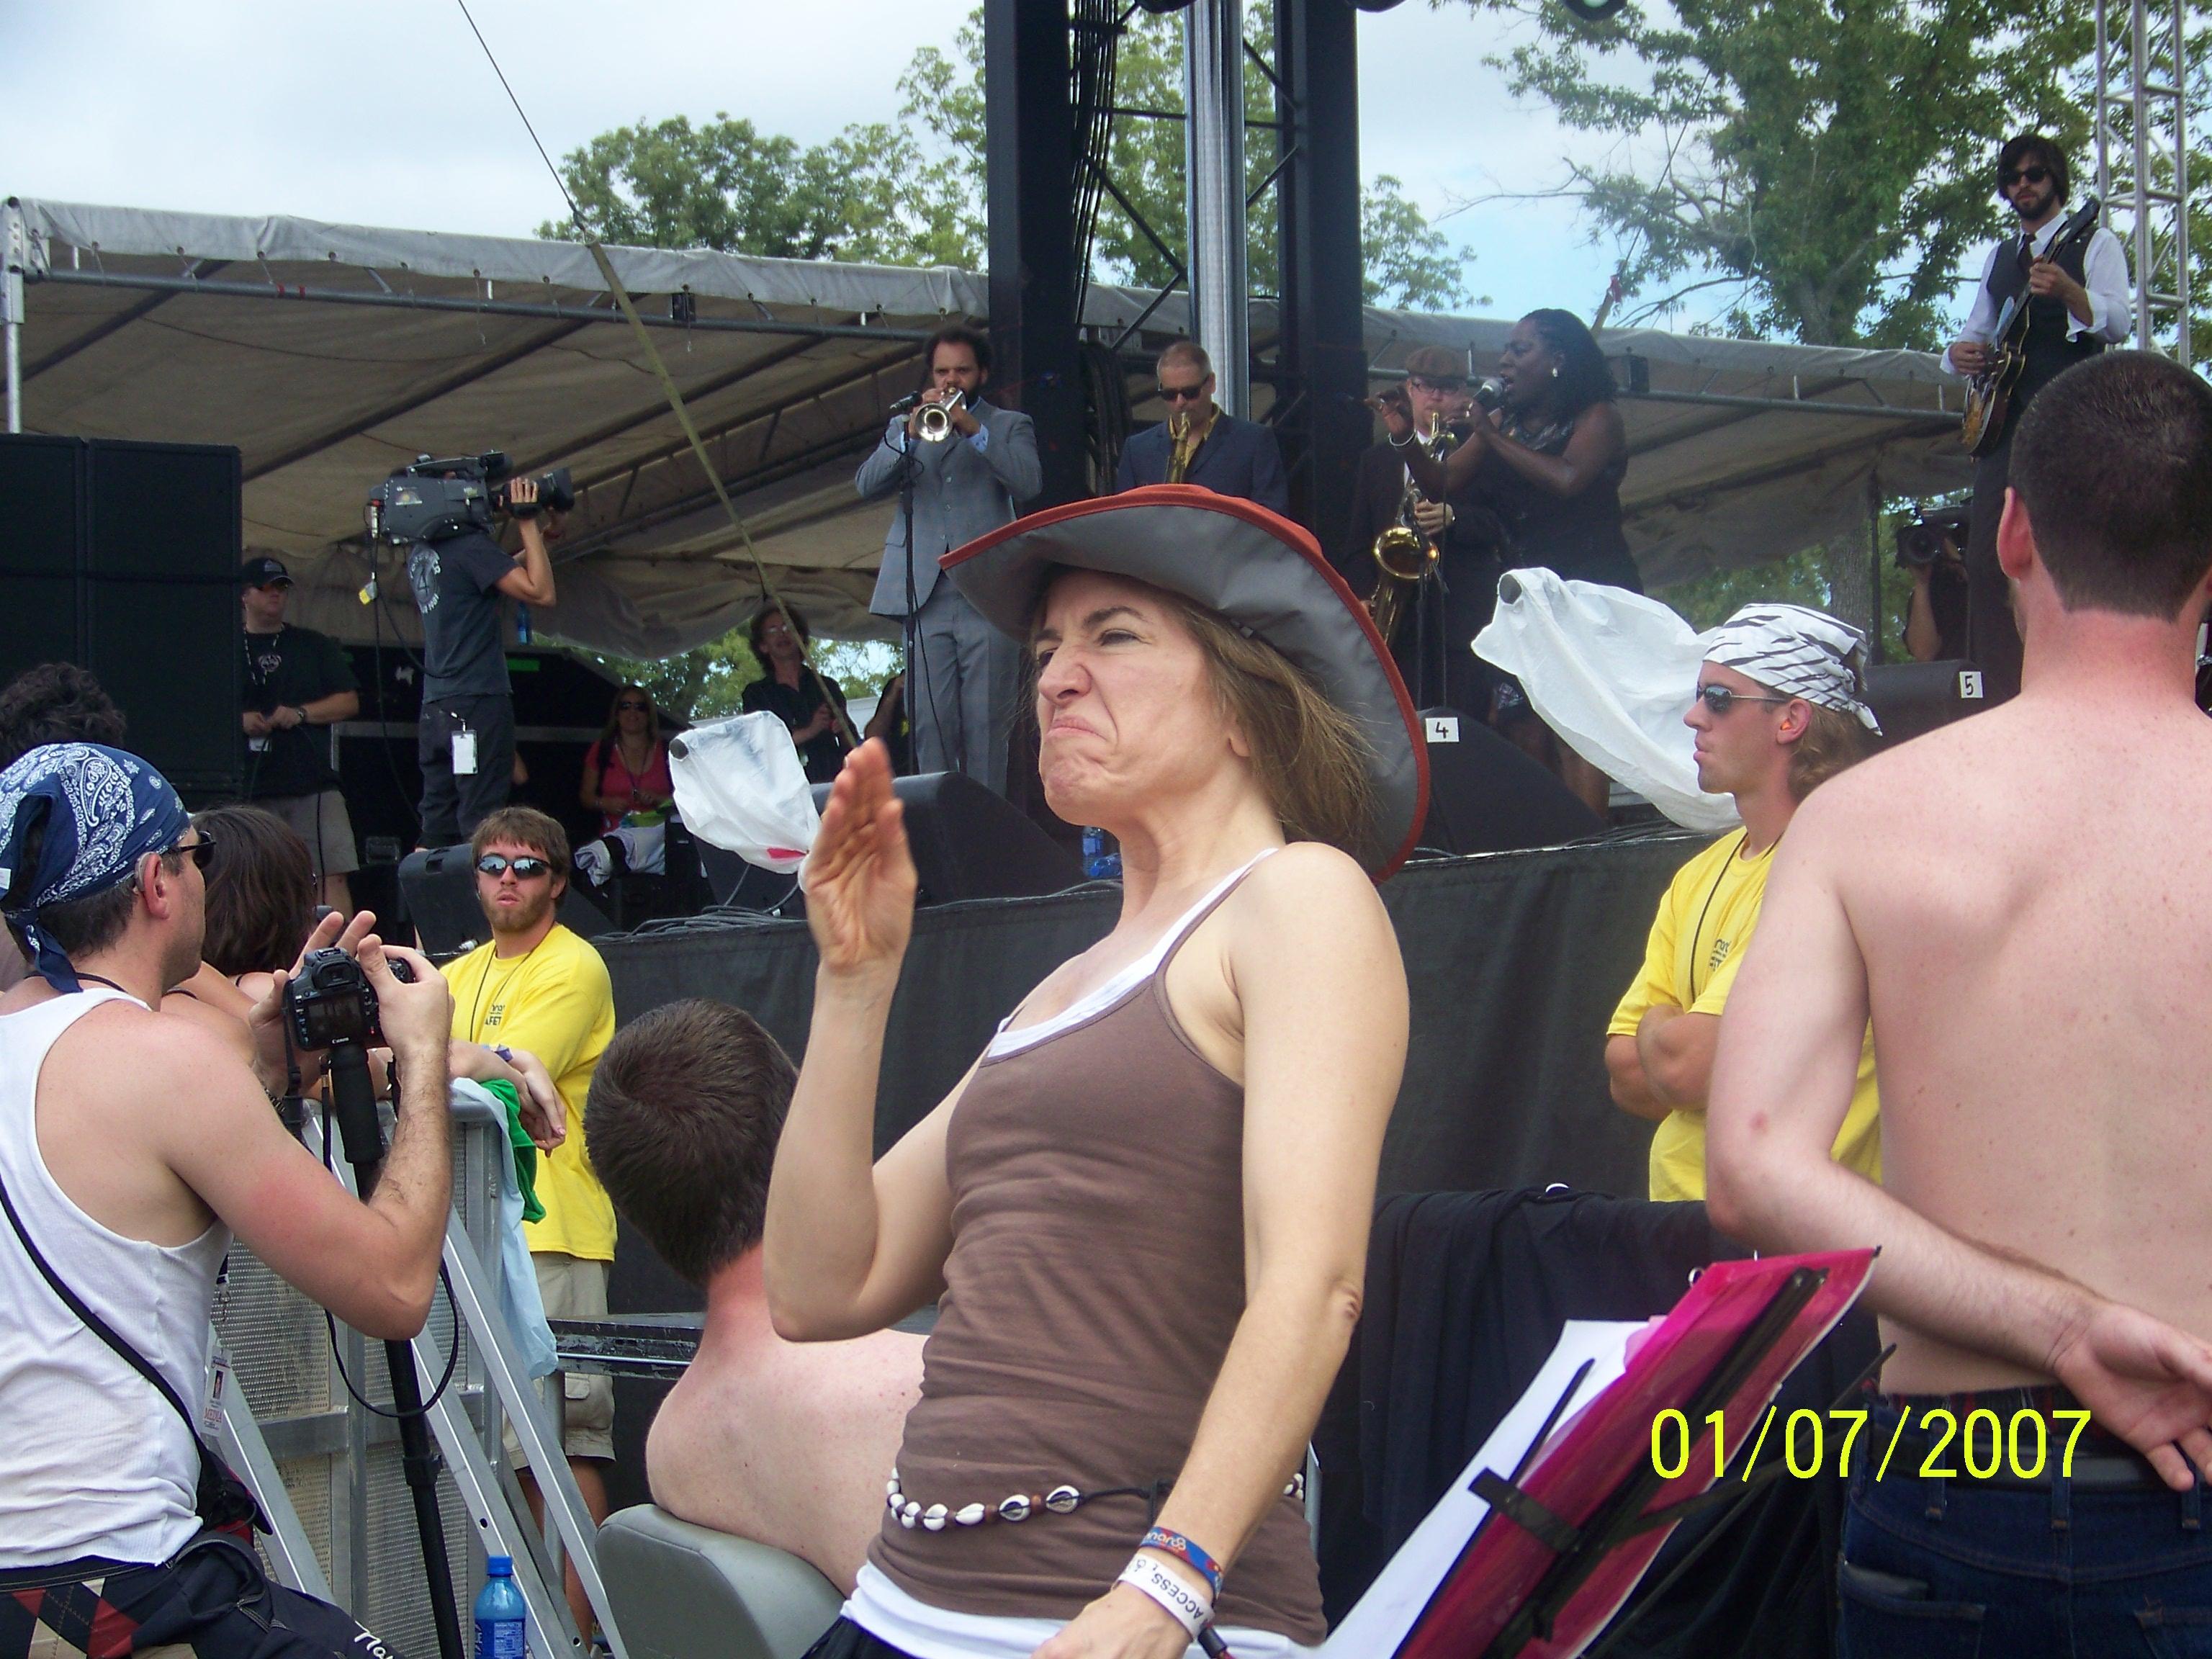 ASL, Sharon Jones, Bonnaroo, music